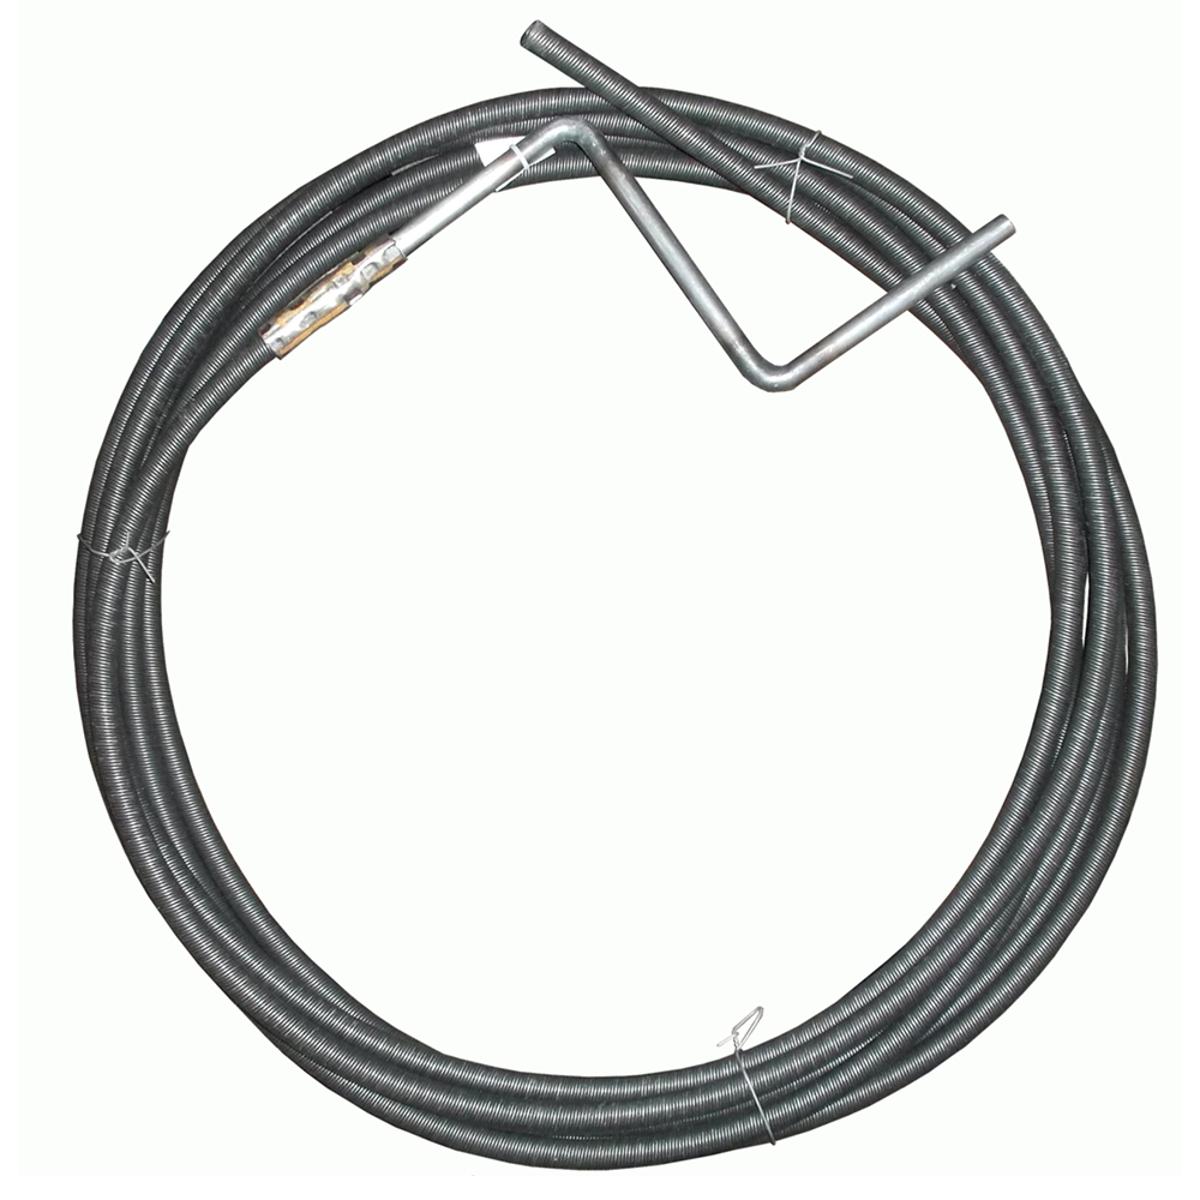 Трос для прочистки канализационных труб Masterprof, пружинный, 5,5 мм х 3 м014-TKПружинный трос Masterprof предназначен для прочистки канализационных труб.Диаметр: 5,5 мм.Длина 3 метра.